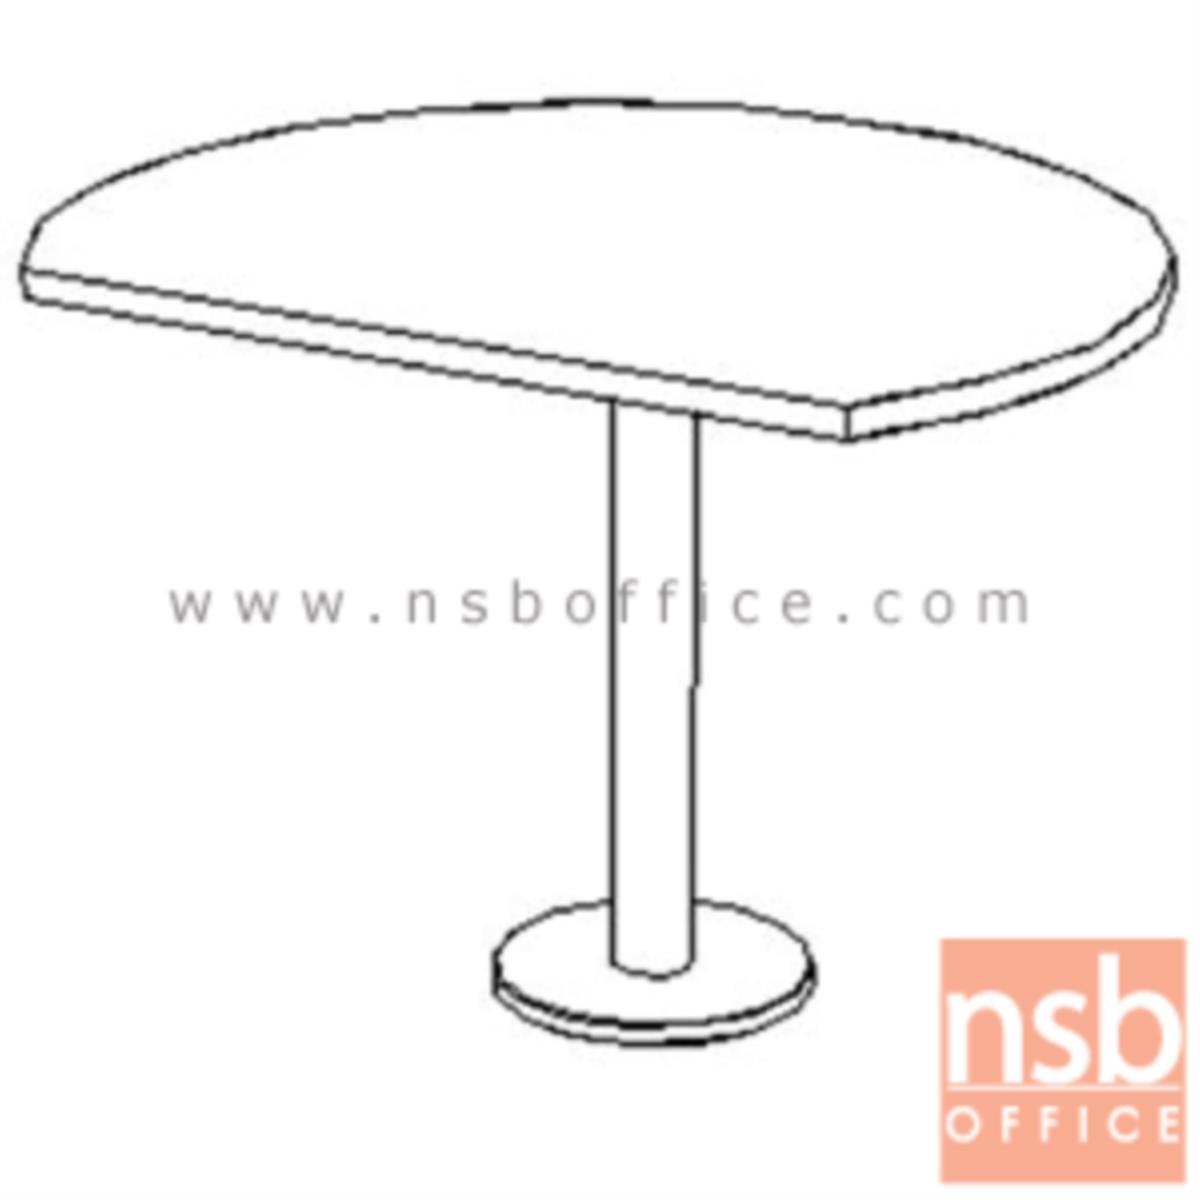 A04A154:โต๊ะเข้ามุม  รุ่น Frankie (แฟรงกี้) ขนาด 120Di cm.  ขาเหล็กพ่นดำ